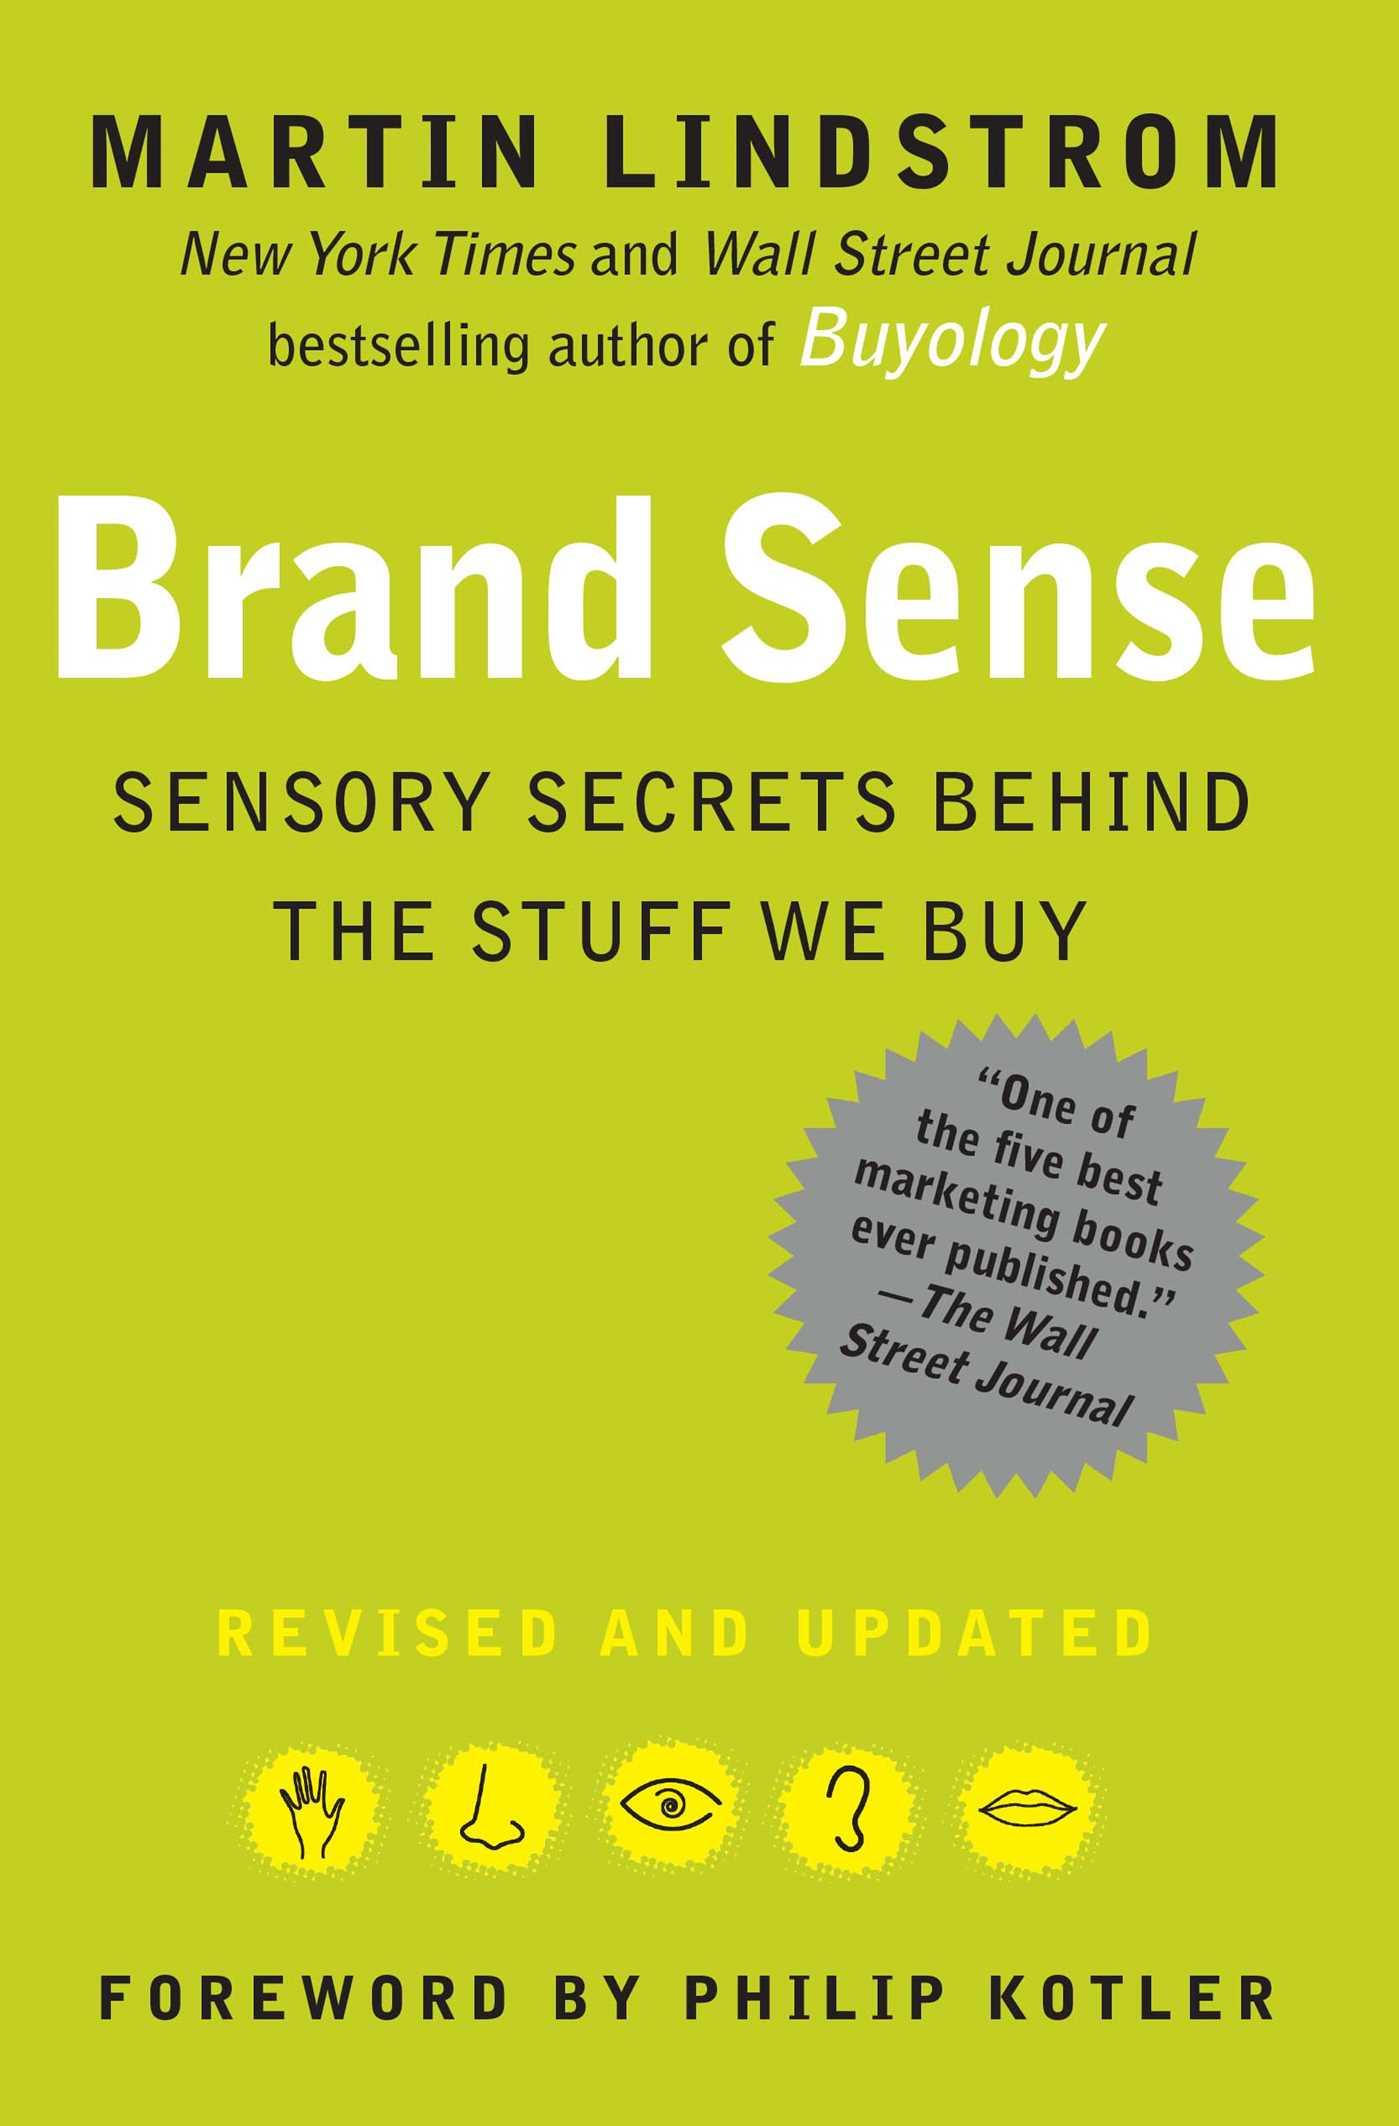 Brand sense ebook by martin lindstrom philip kotler official brand sense 9781439103456 hr fandeluxe Gallery